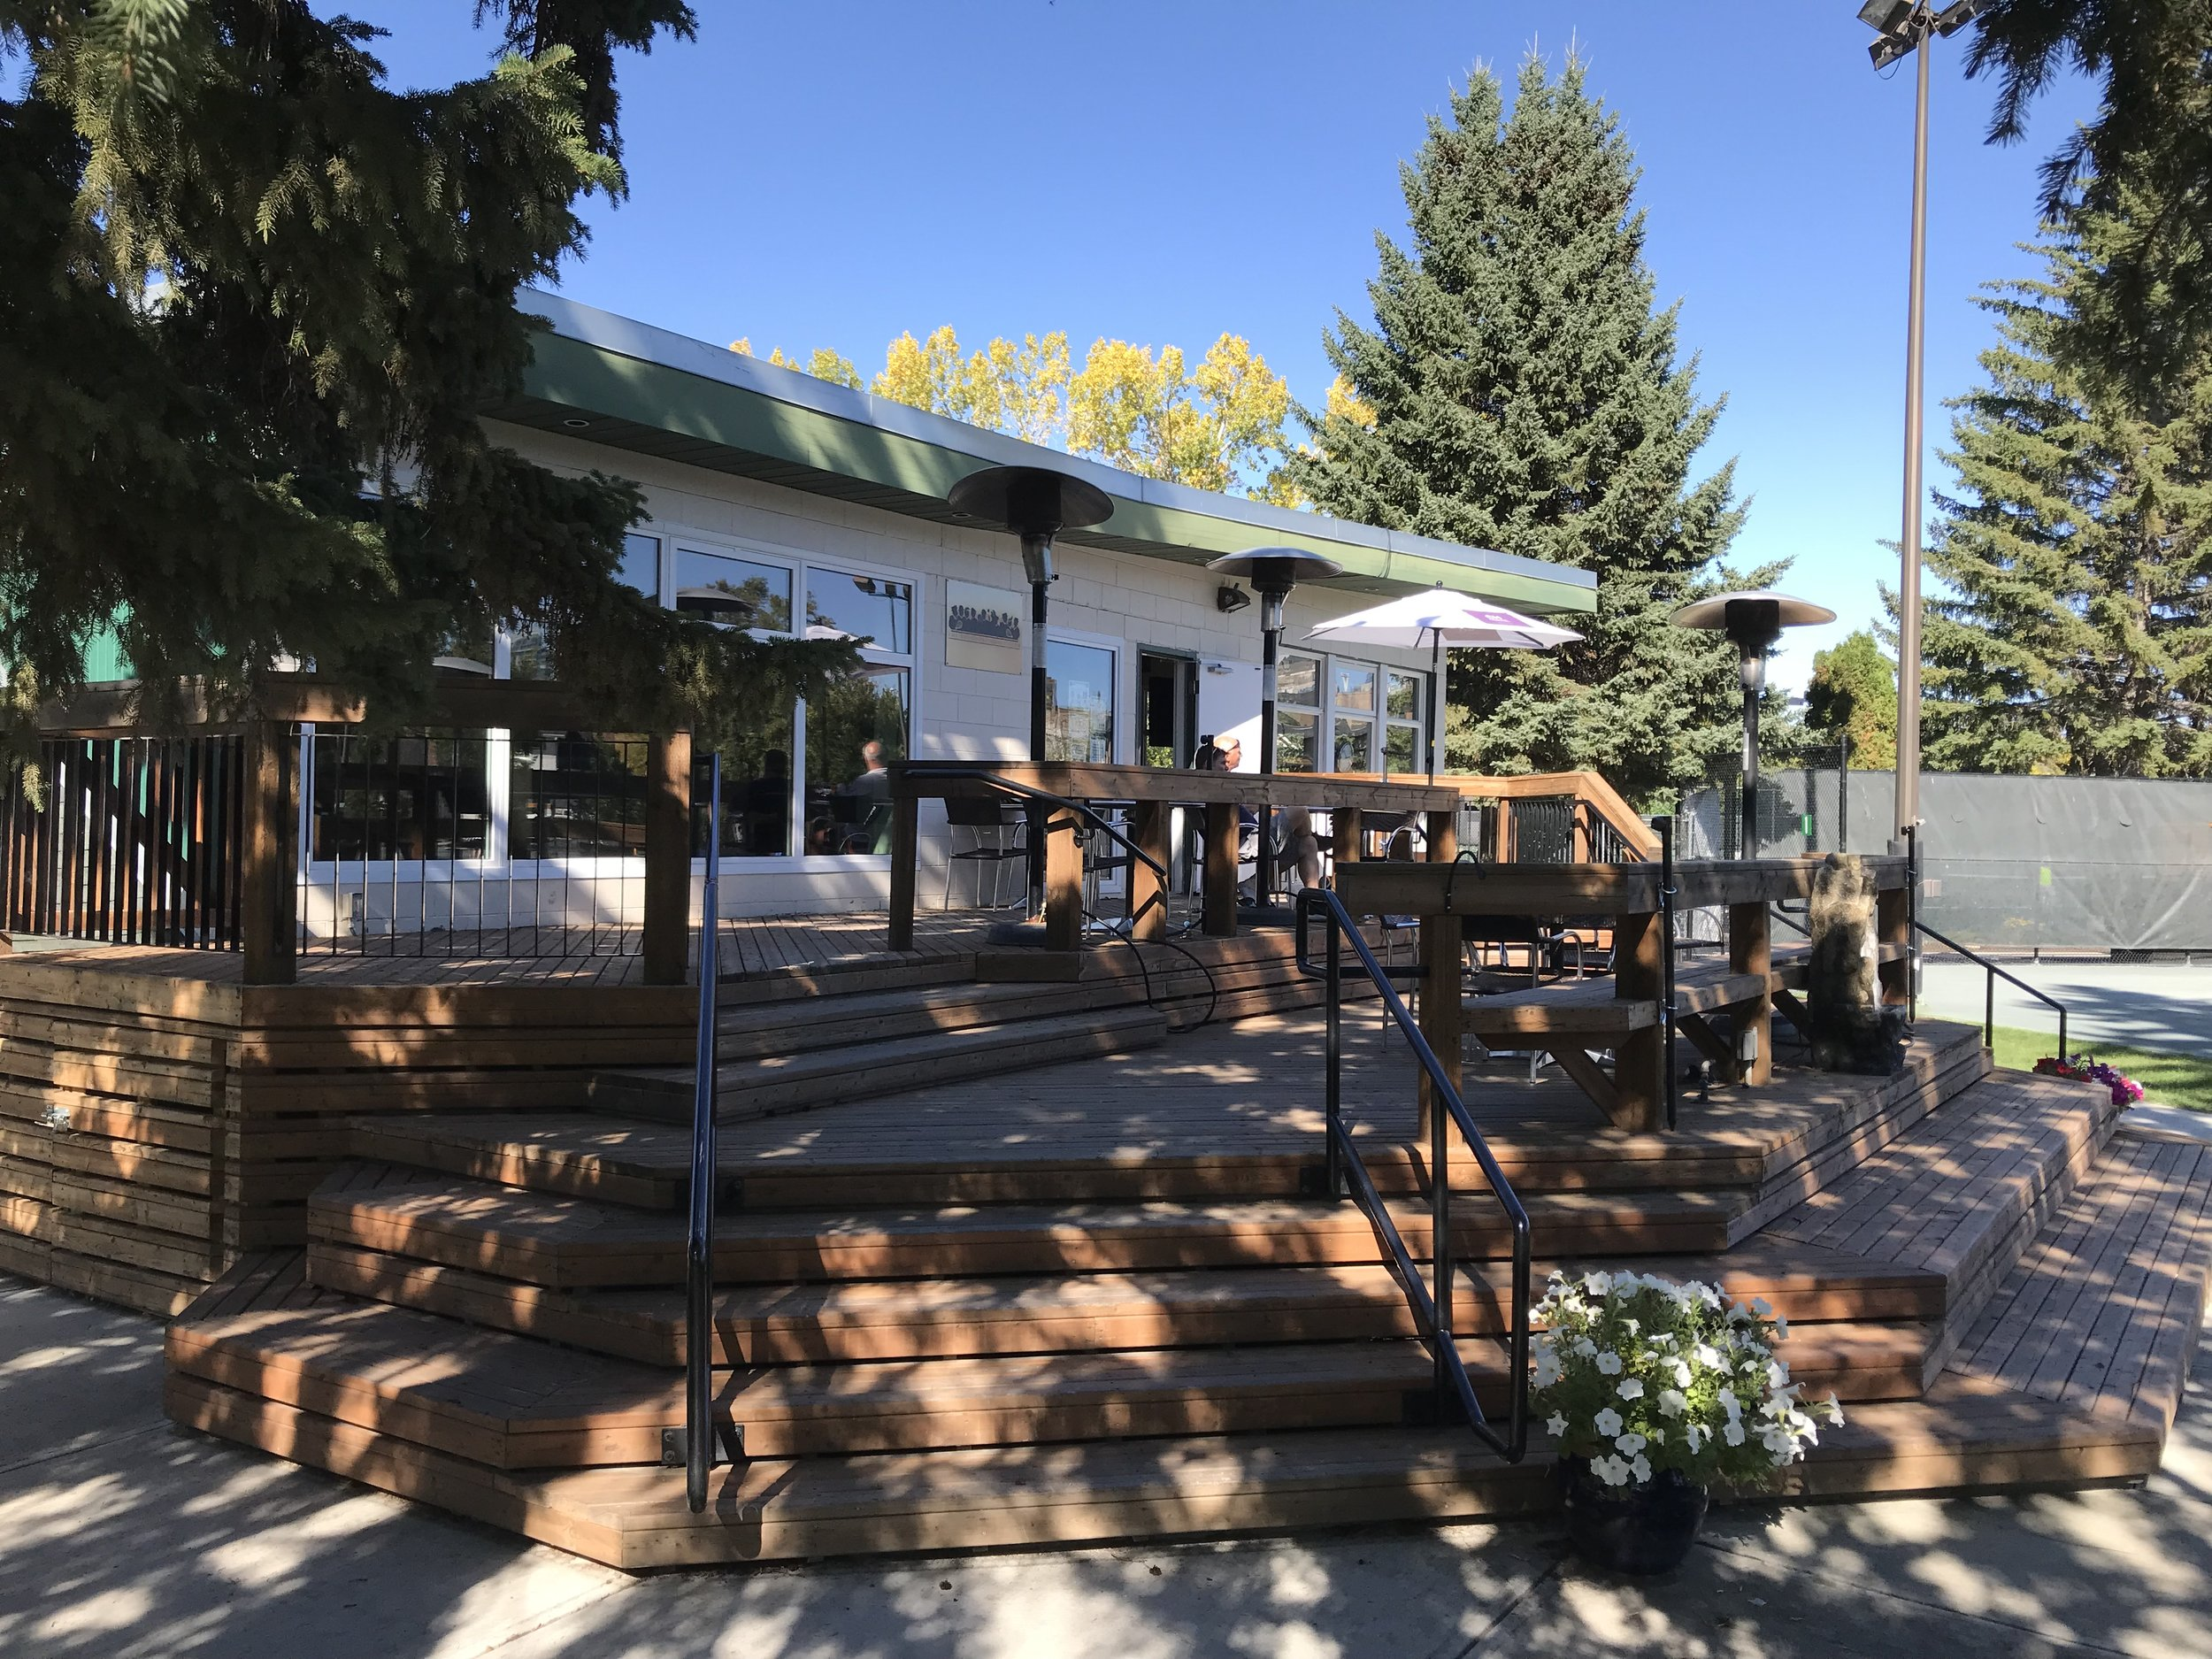 Calgary Tennis Club Cafe is a hidden gem.